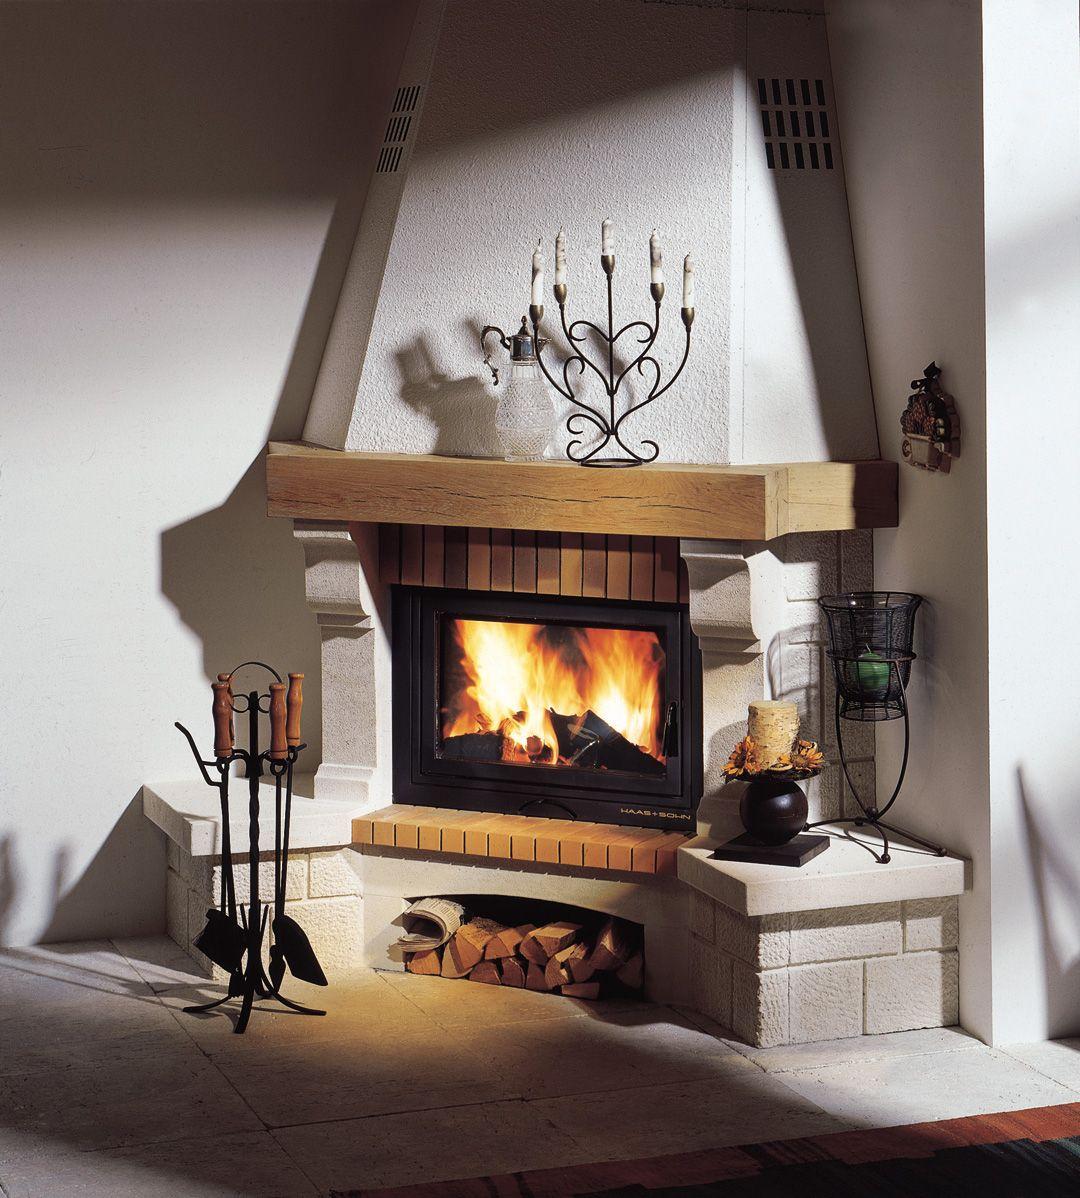 Corner fireplace corner fireplace mantels fireplace - Pictures of corner fireplaces ...